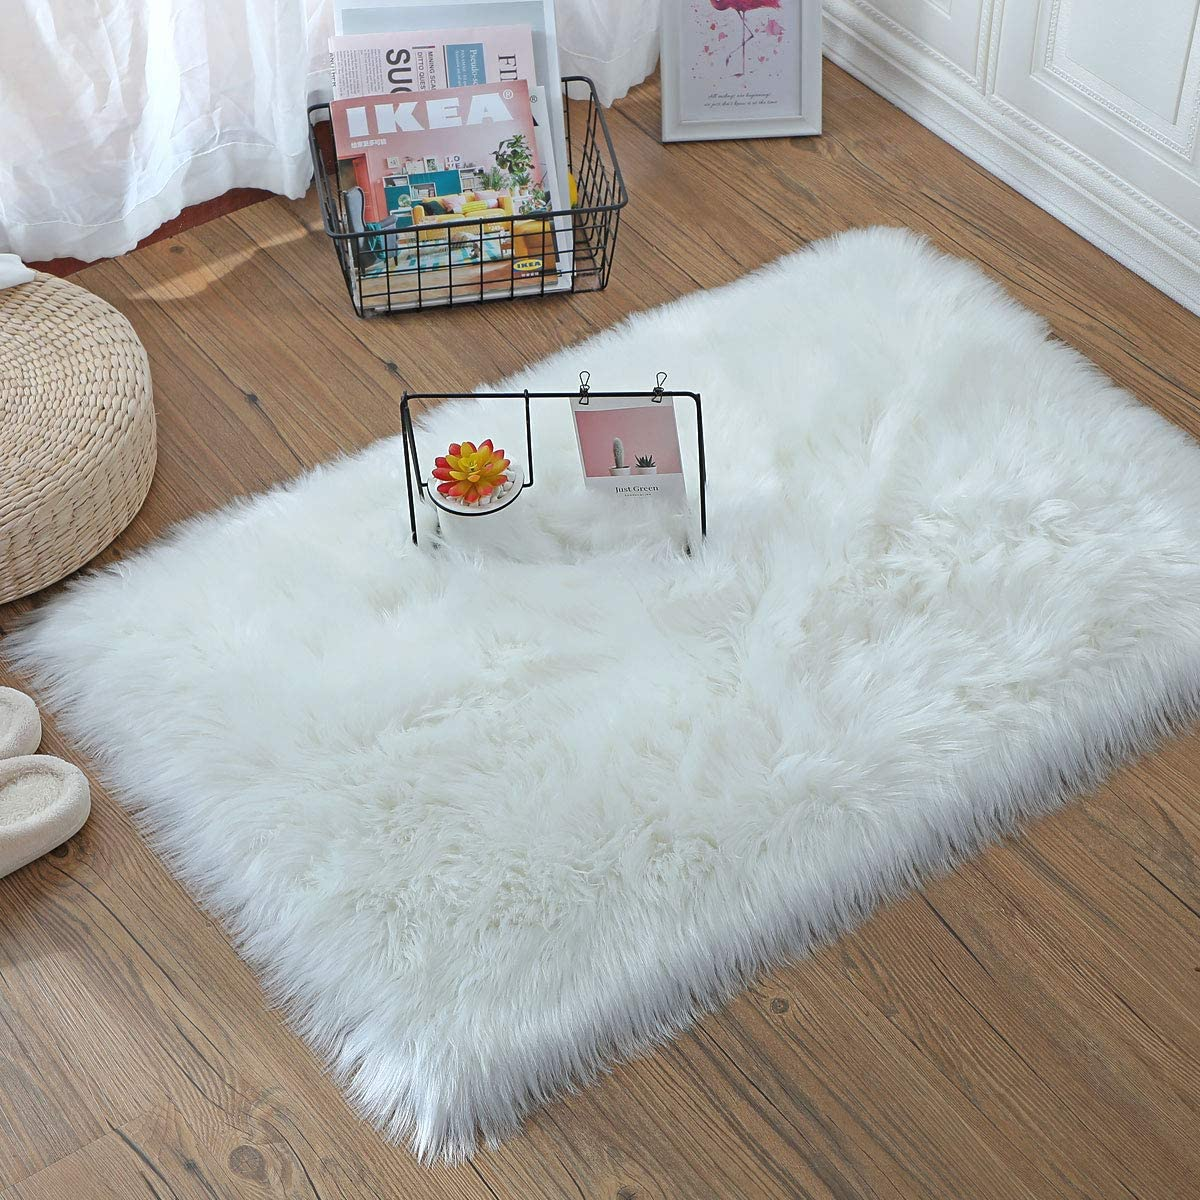 HLZHOU Soft Fluffy Rug Faux Fur Rug Furry Sheepskin Bedside Area Rug for Bedroom Floor Sofa Living Room 2 x 3 Feet White